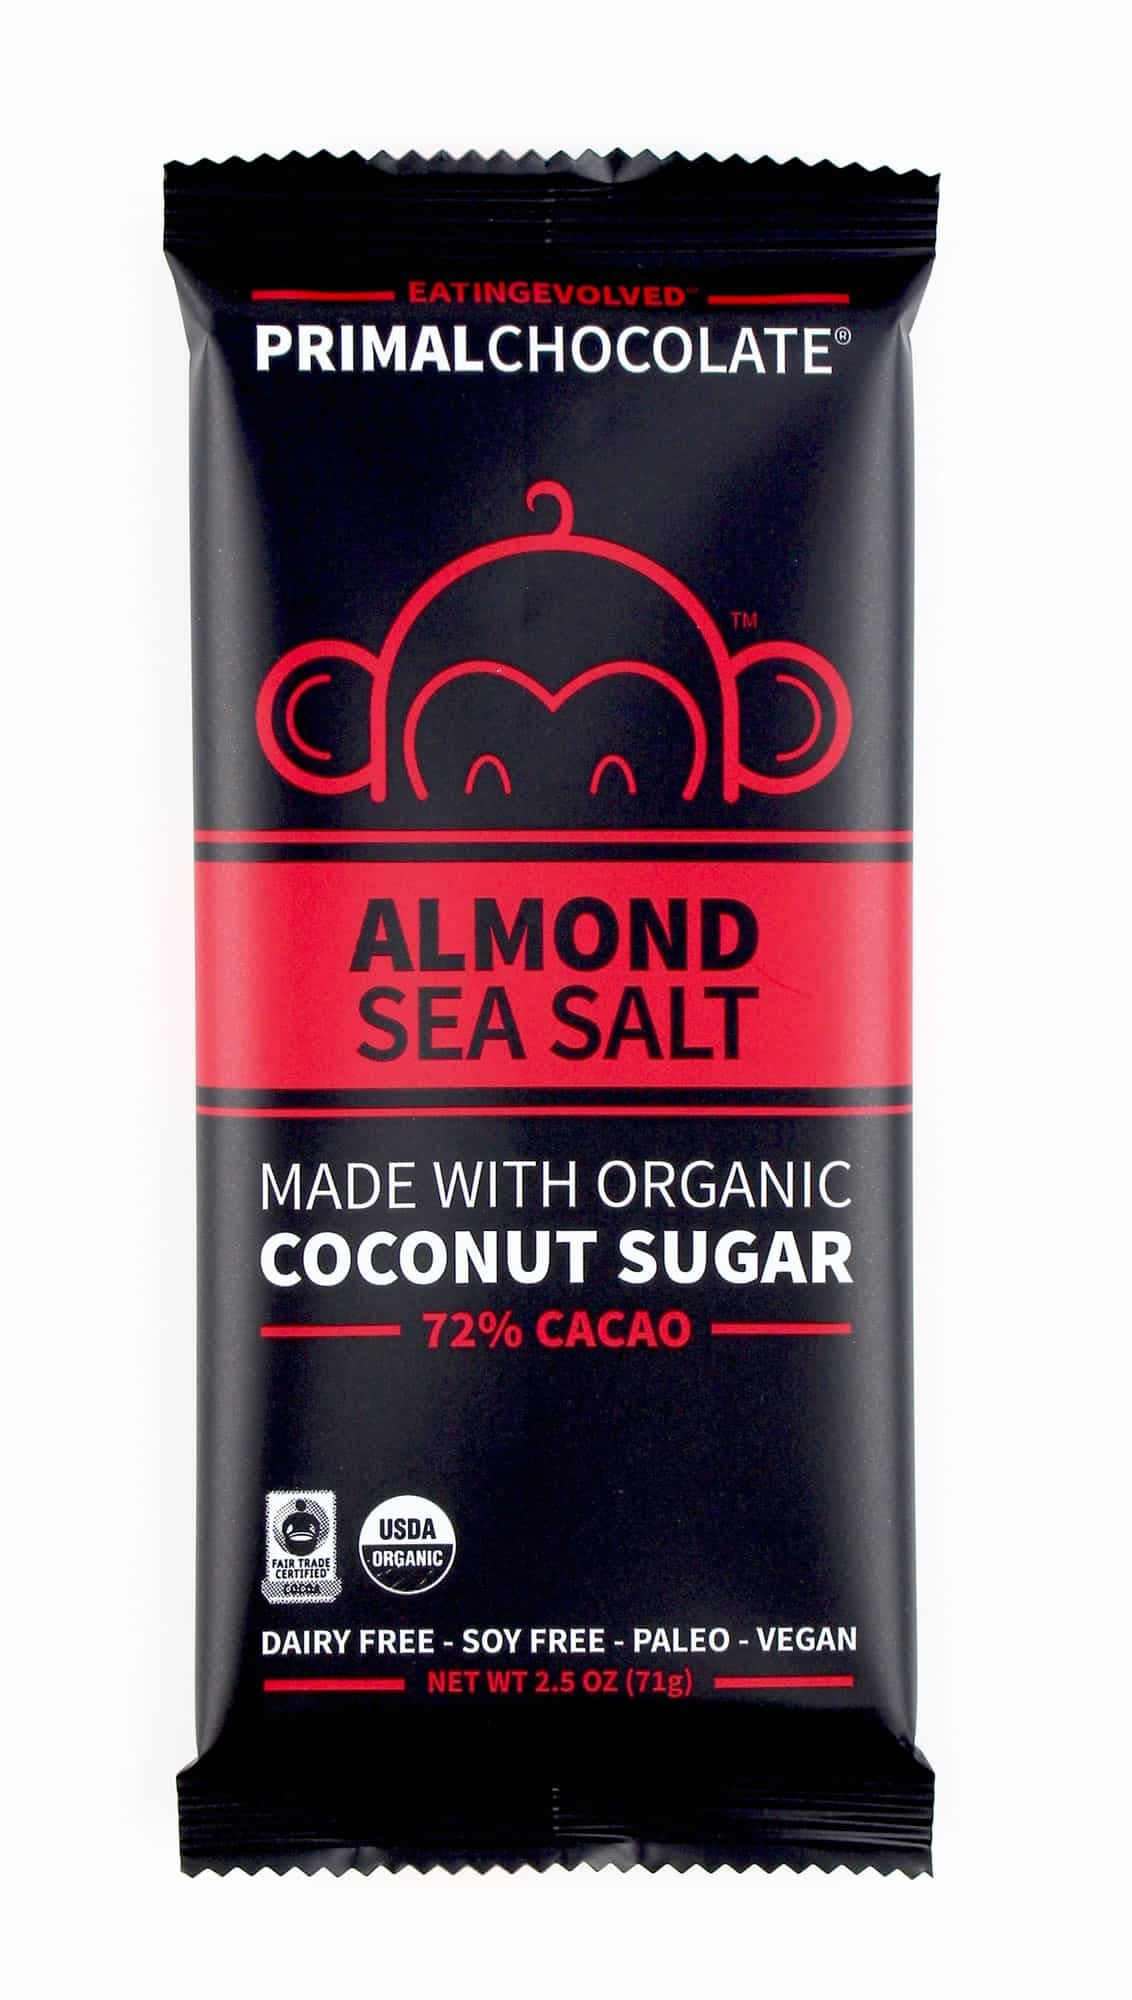 Almond-Sea-Salt-Primal-Chocolate-Front_1800x.jpg